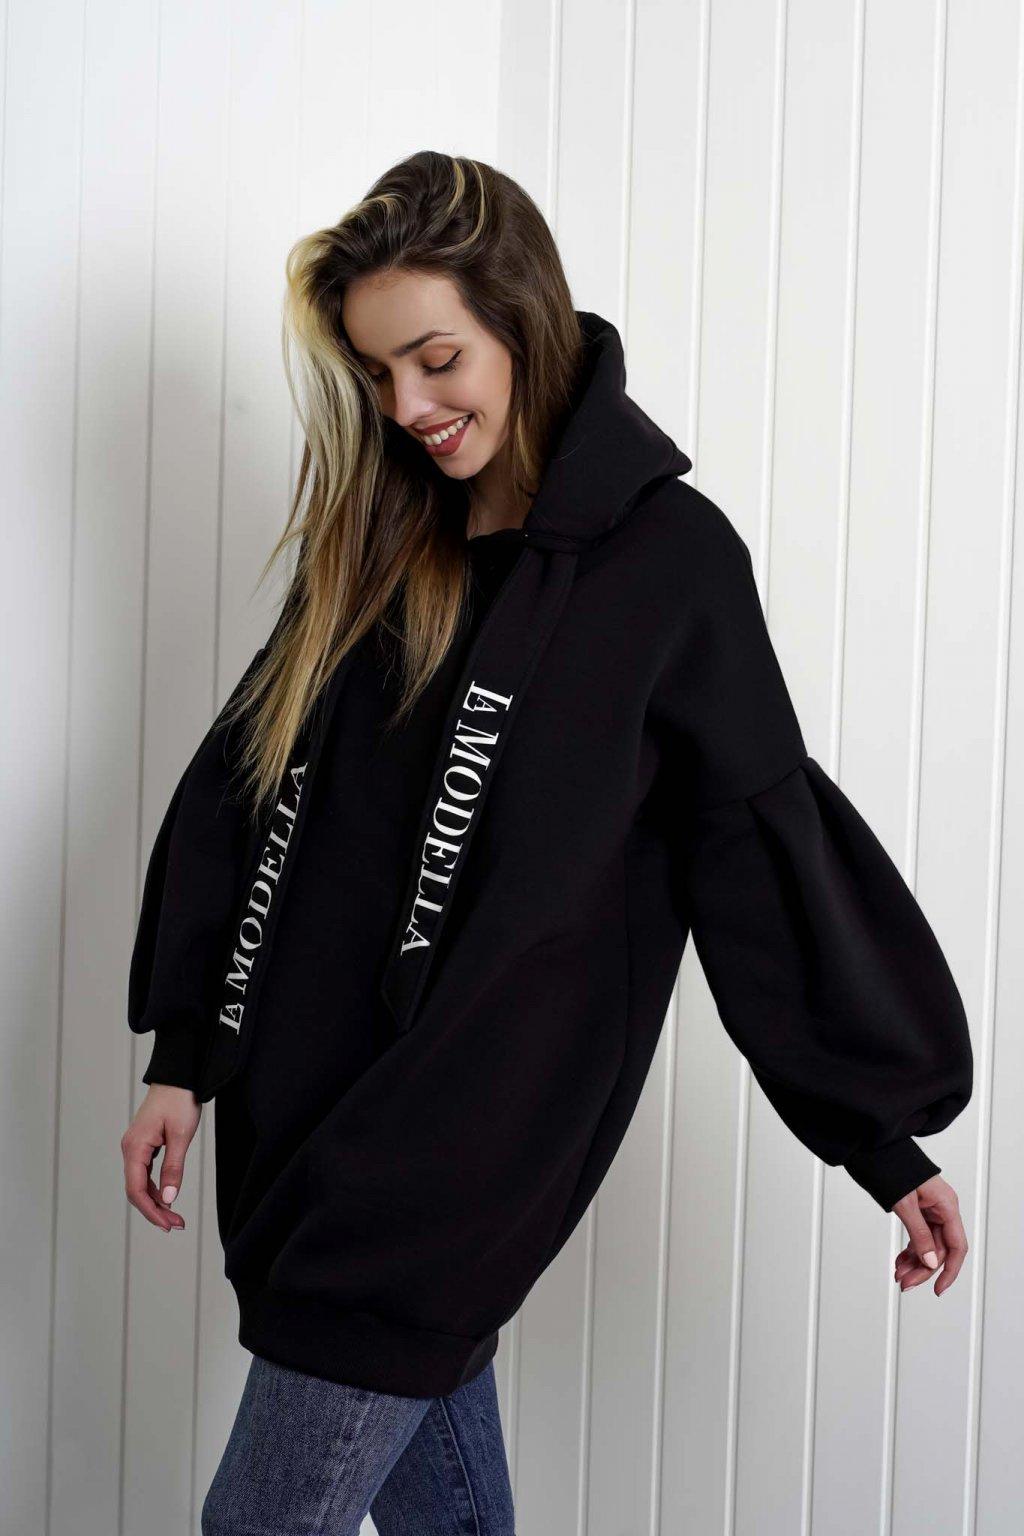 mikina, dámska, oversize, čierna, biela, farebná, športová, elegantná, štýlová, cribs oblečenie, dámske oblečenie, 272